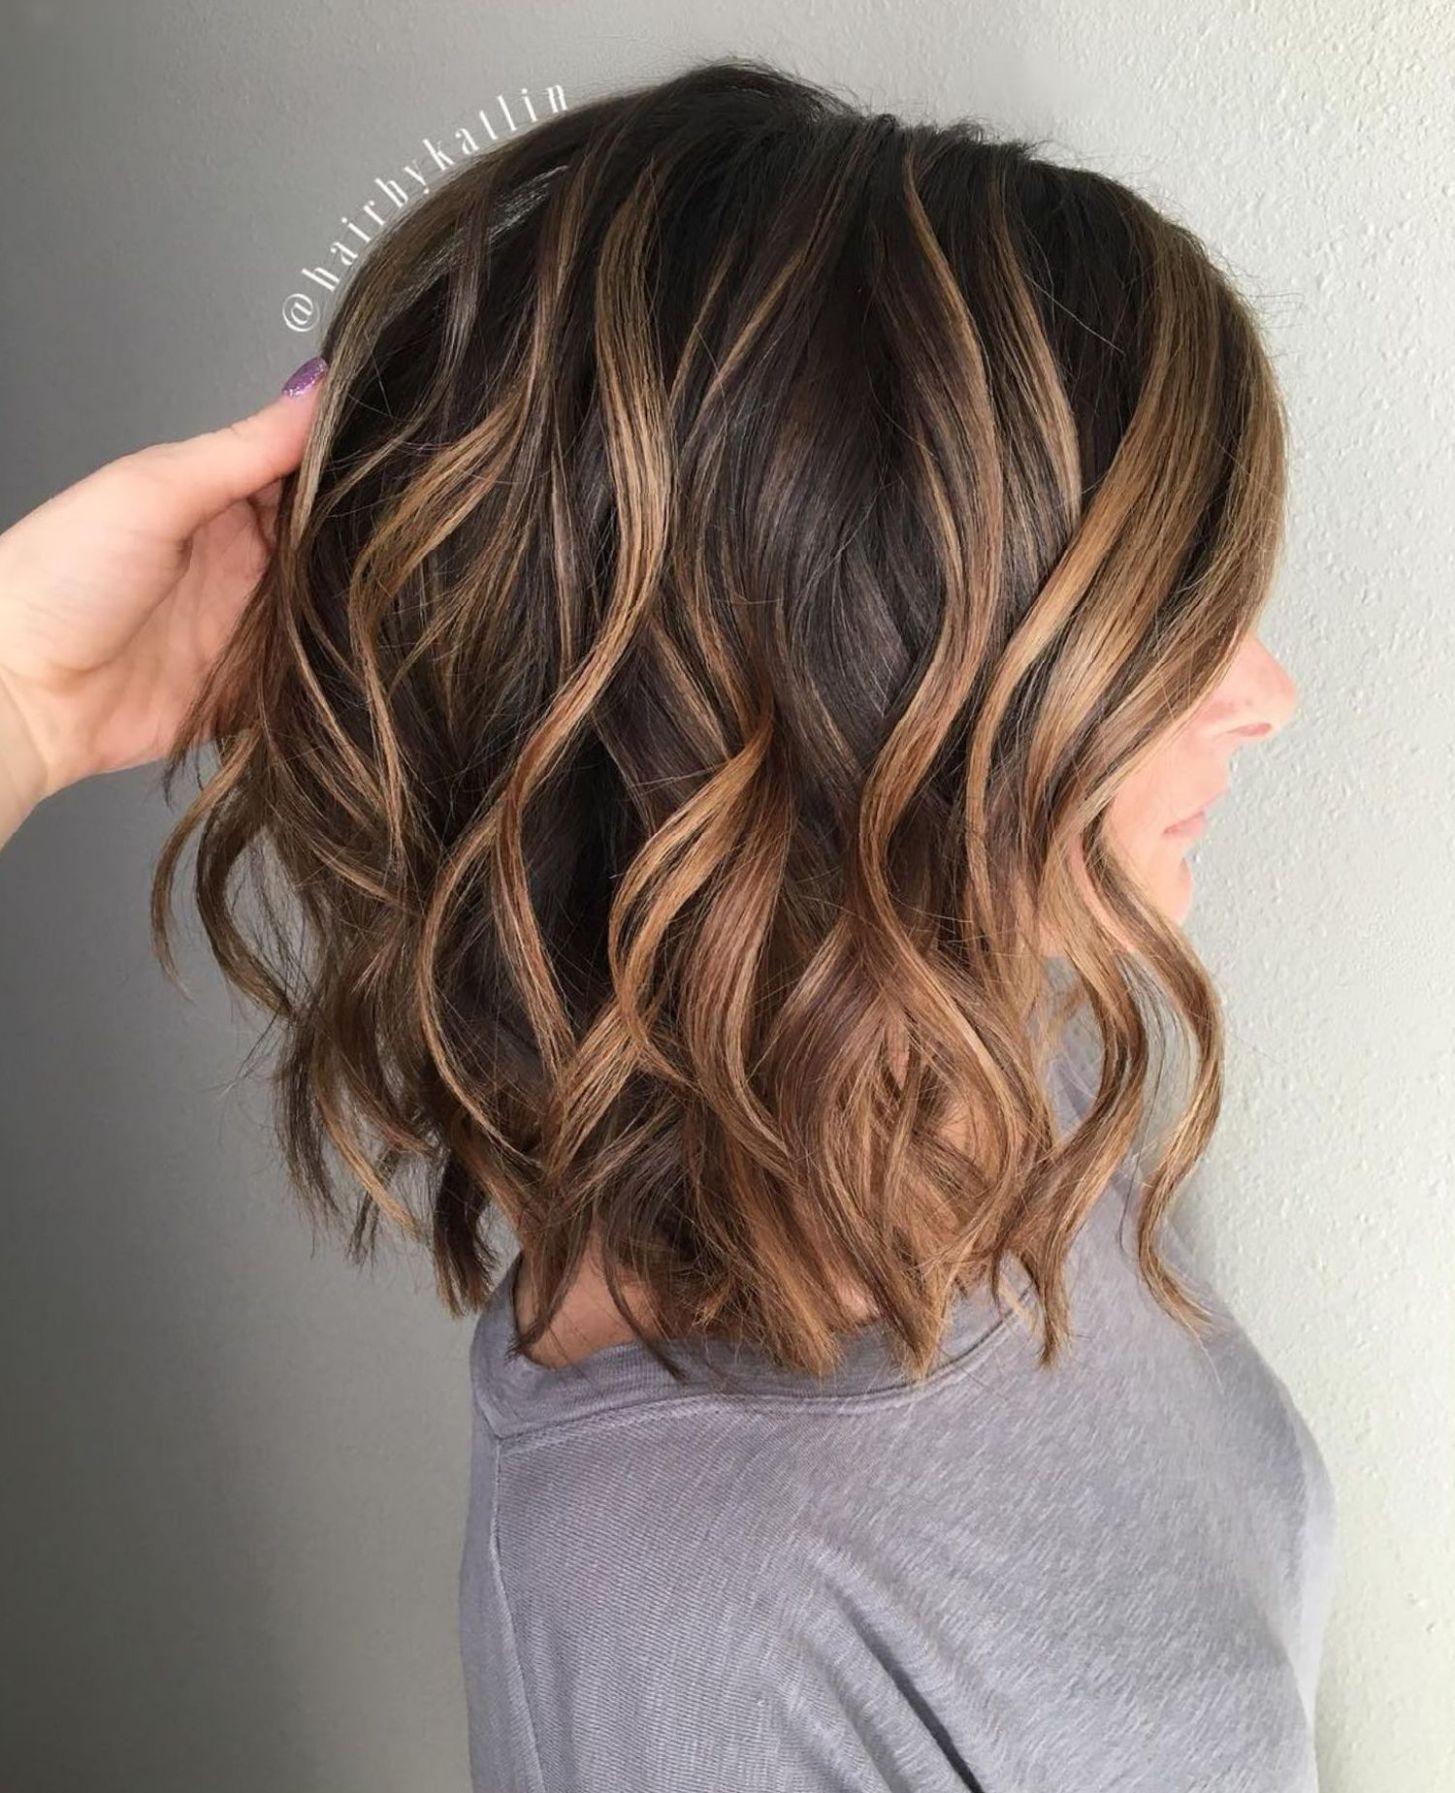 Caramel Highlights For Medium Brown Hair Medium Hair Styles Hair Styles Short Hair Styles